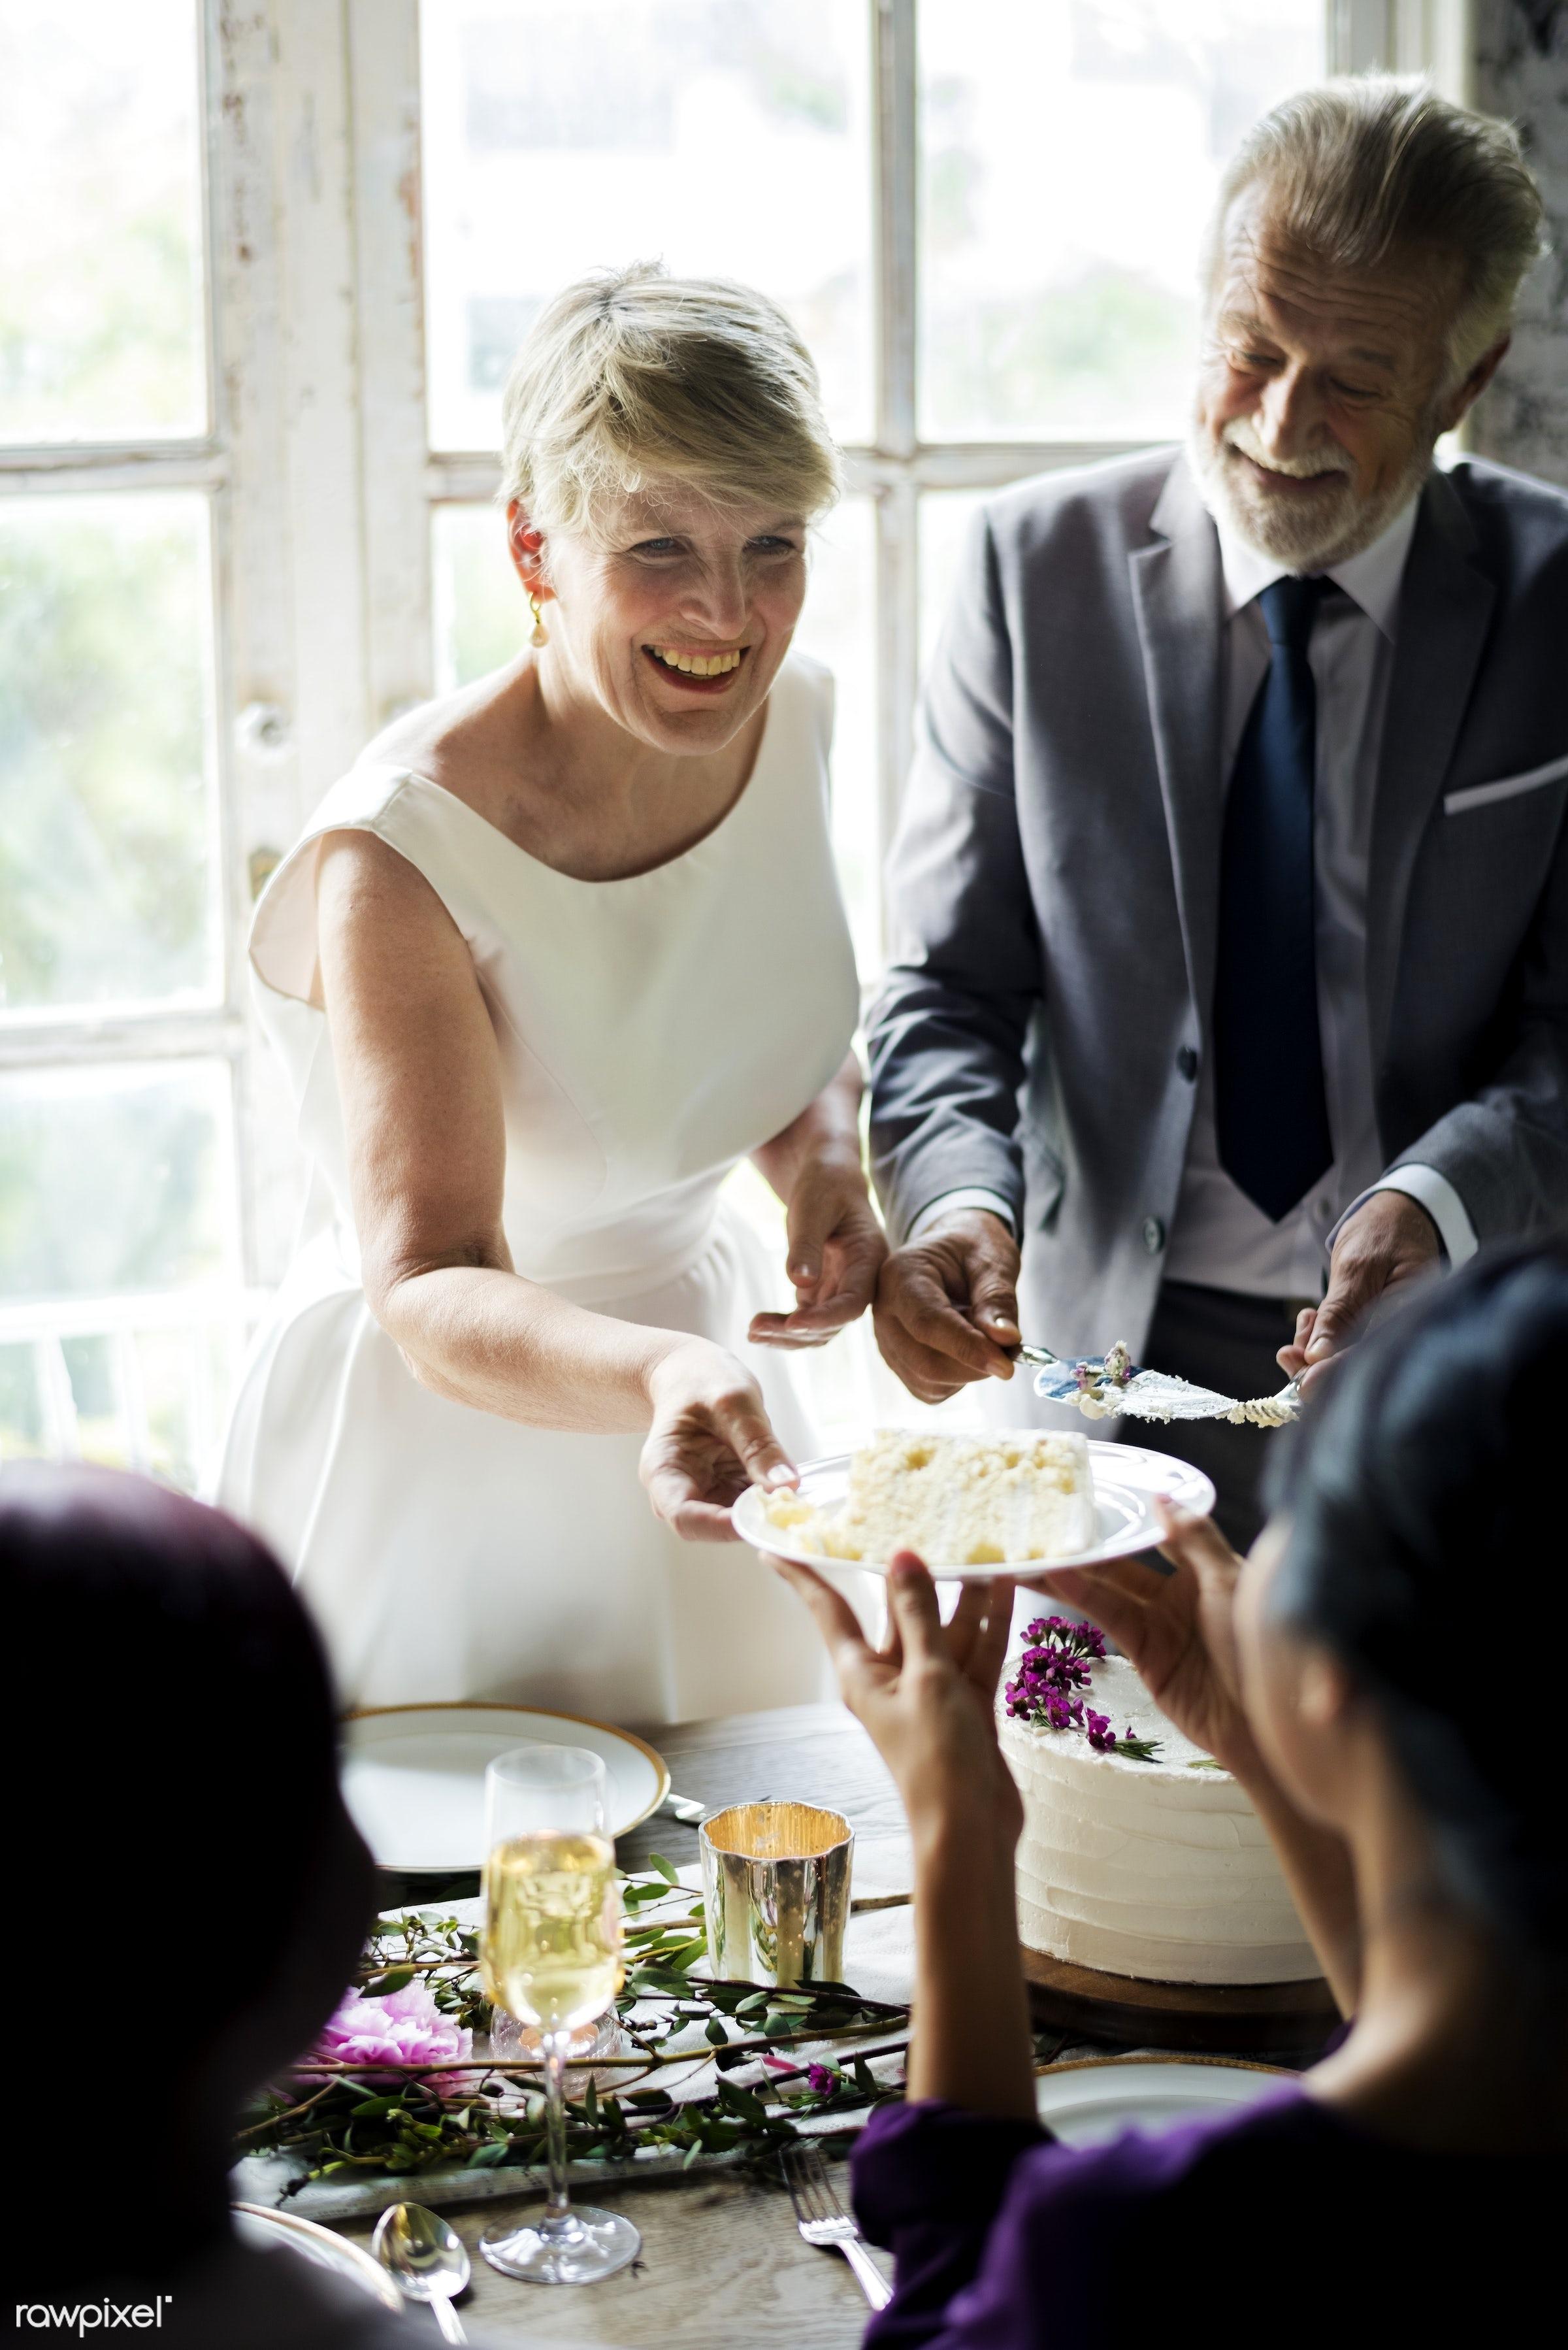 banquet, cake, celebration, cheerful, congrats, congratulations, cut, dessert, dish, diversity, elegance, event, fiance,...